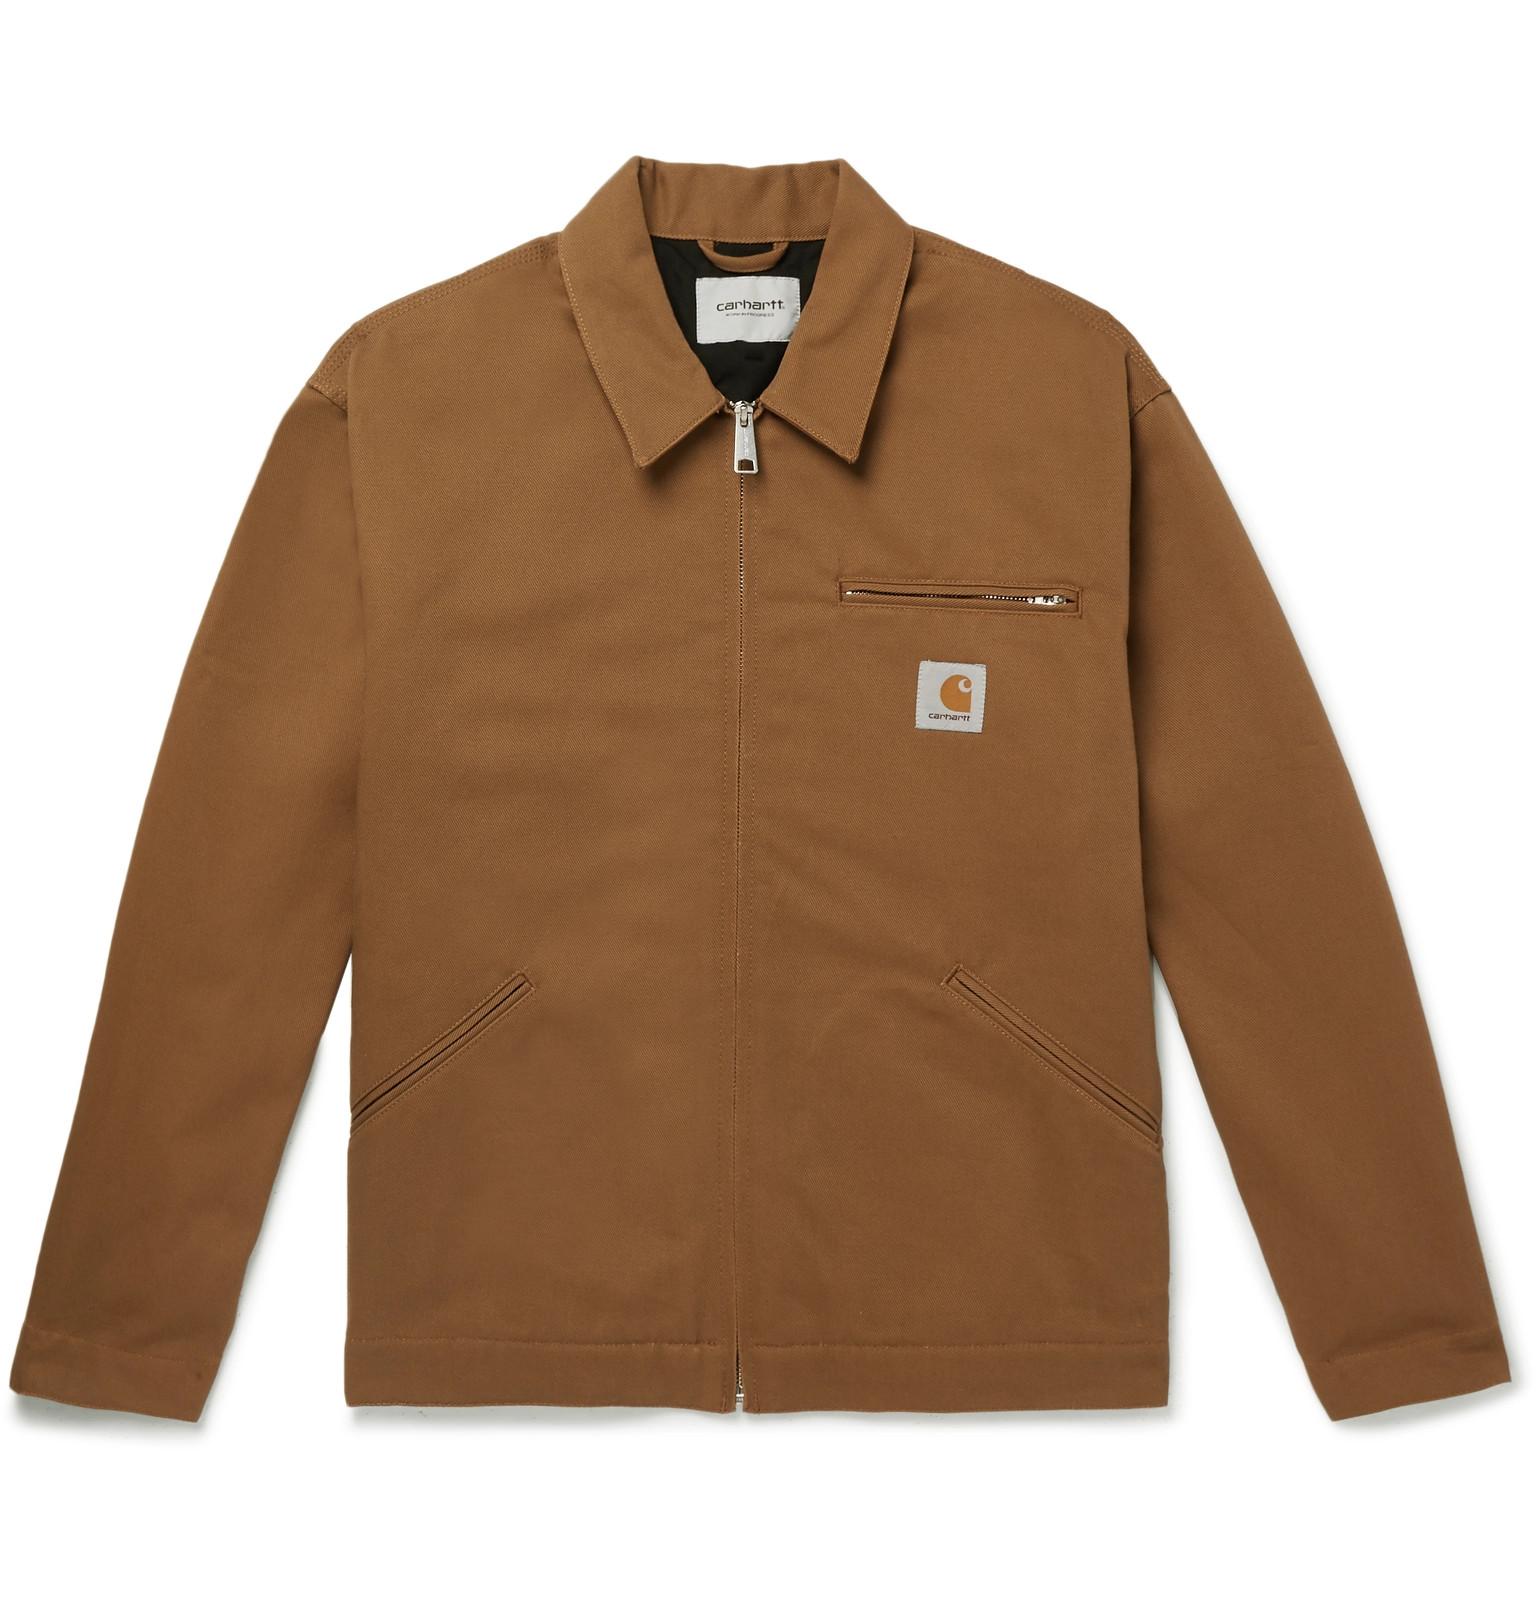 4886266ec9b67 Carhartt WIP - OG Detroit Cotton-Twill Field Jacket